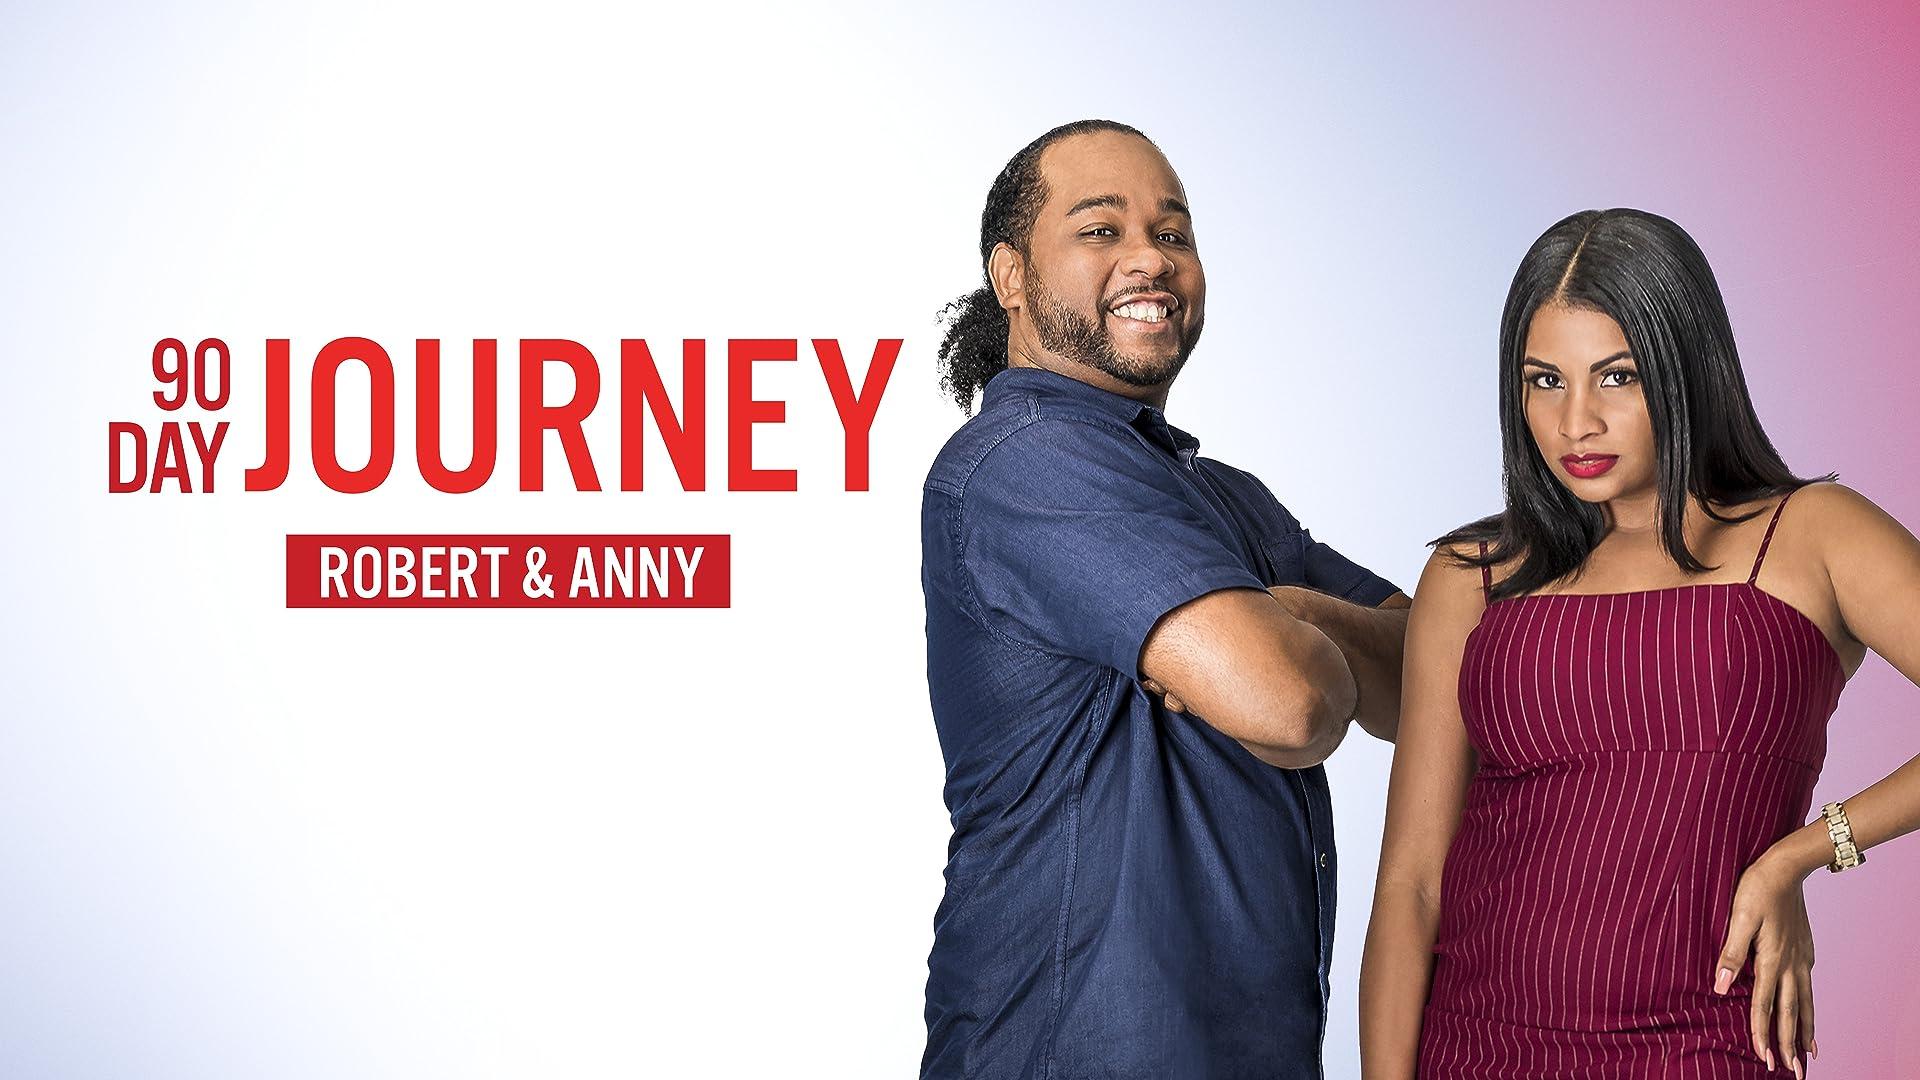 90 Day Journey: Robert & Anny - Season 1